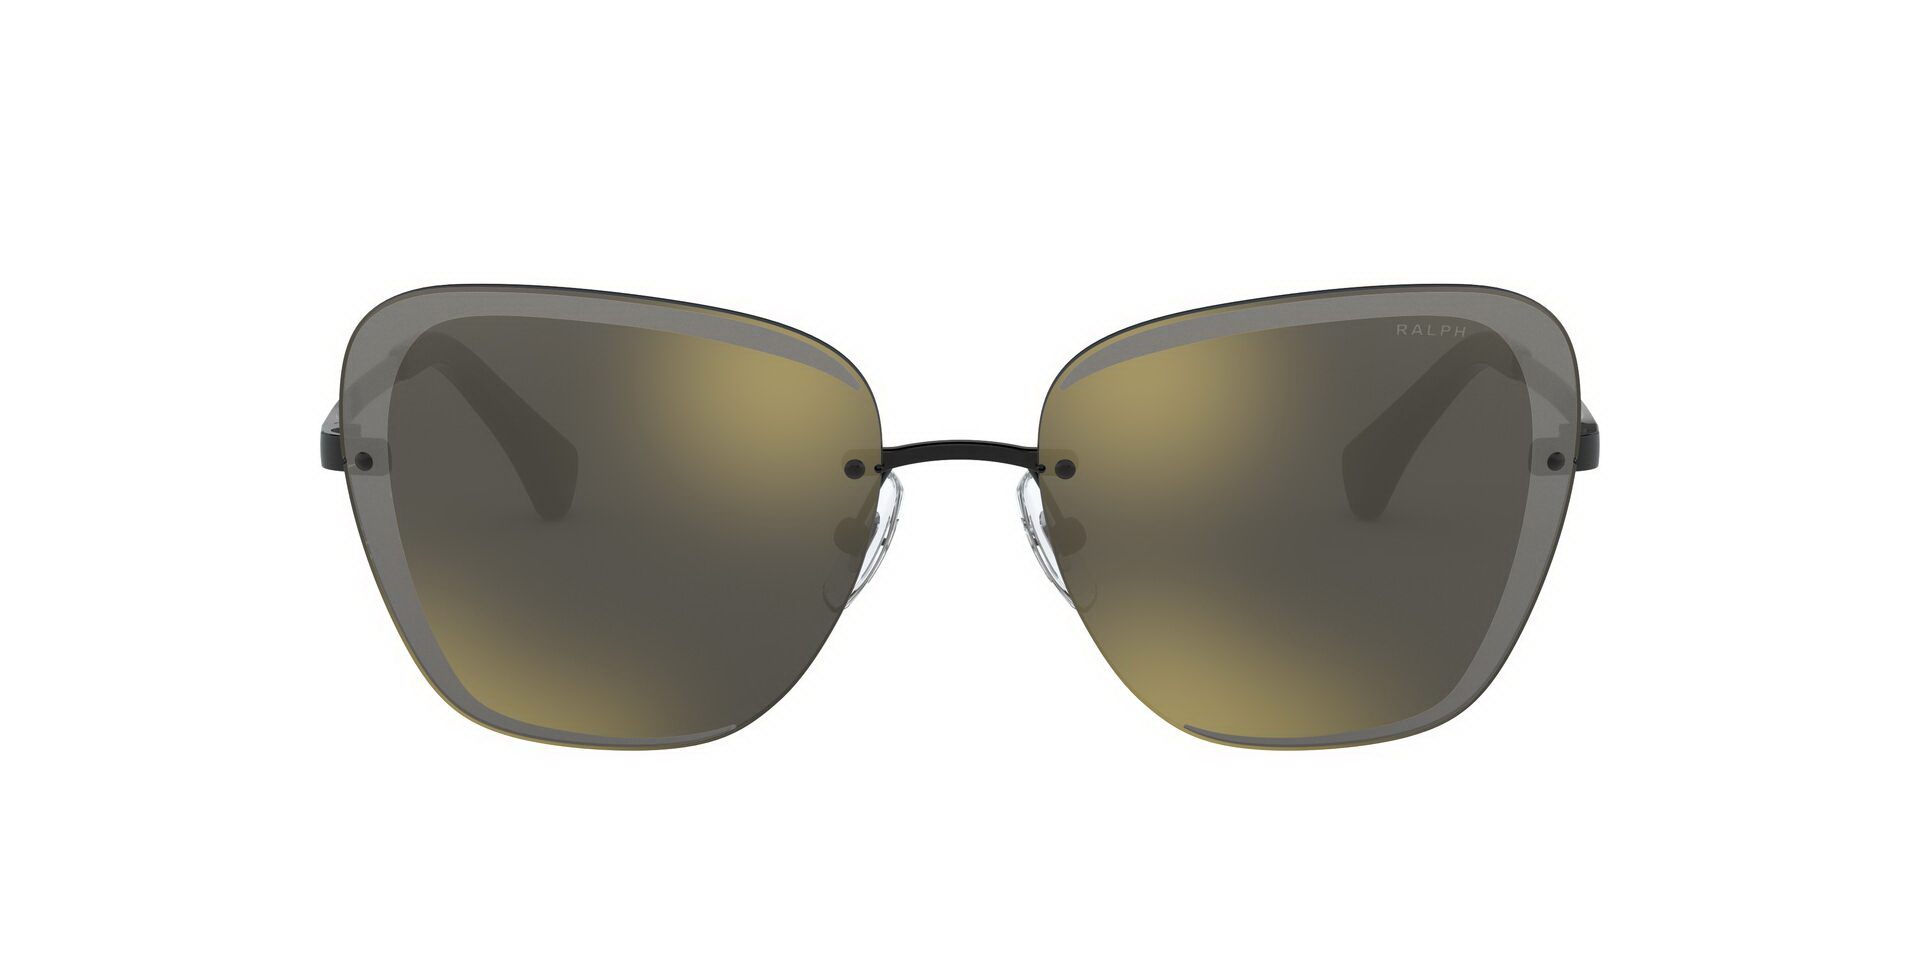 Солнцезащитные очки Очки с/з RALPH 0RA4129 93876G фото